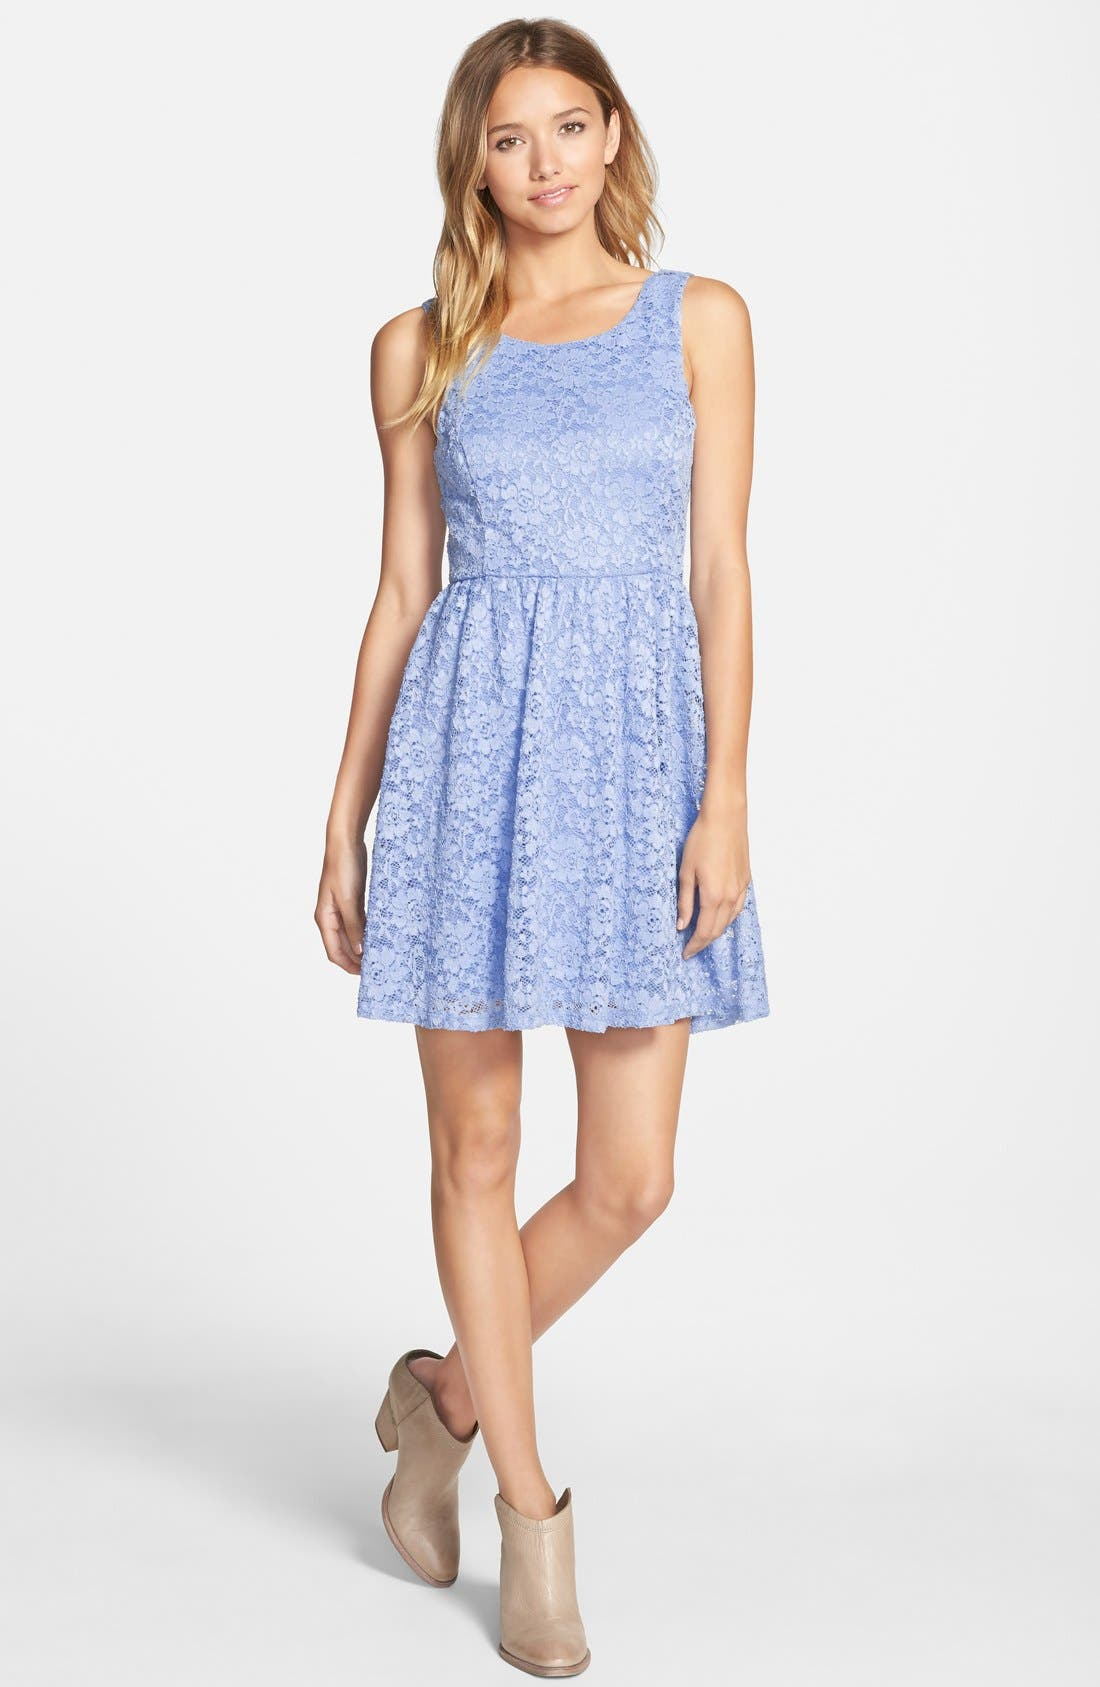 Alternate Image 1 Selected - Lush Lace Skater Dress